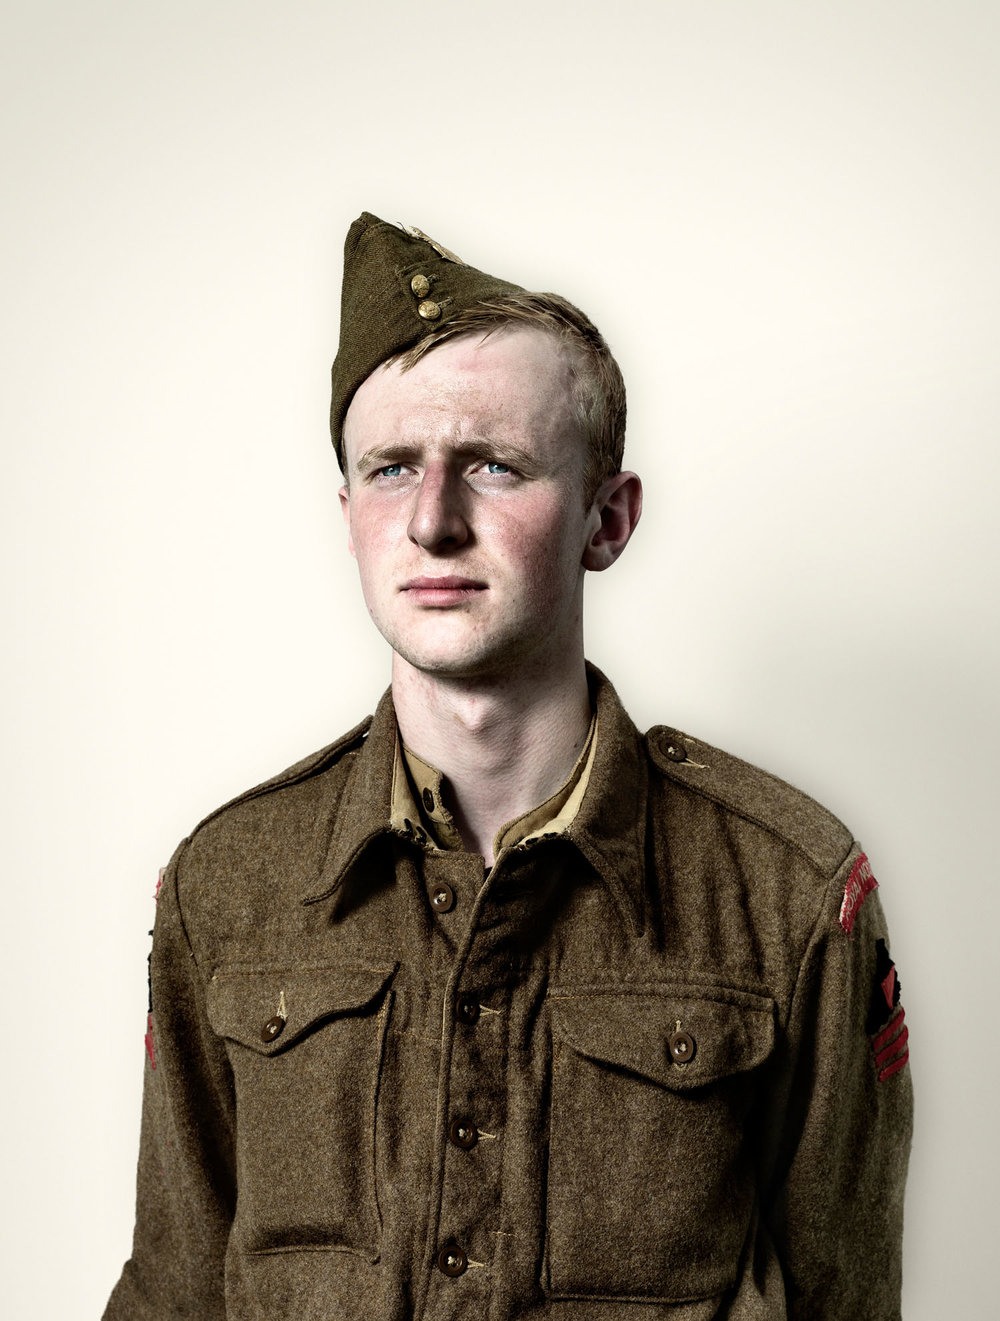 British Infantryman (2008)